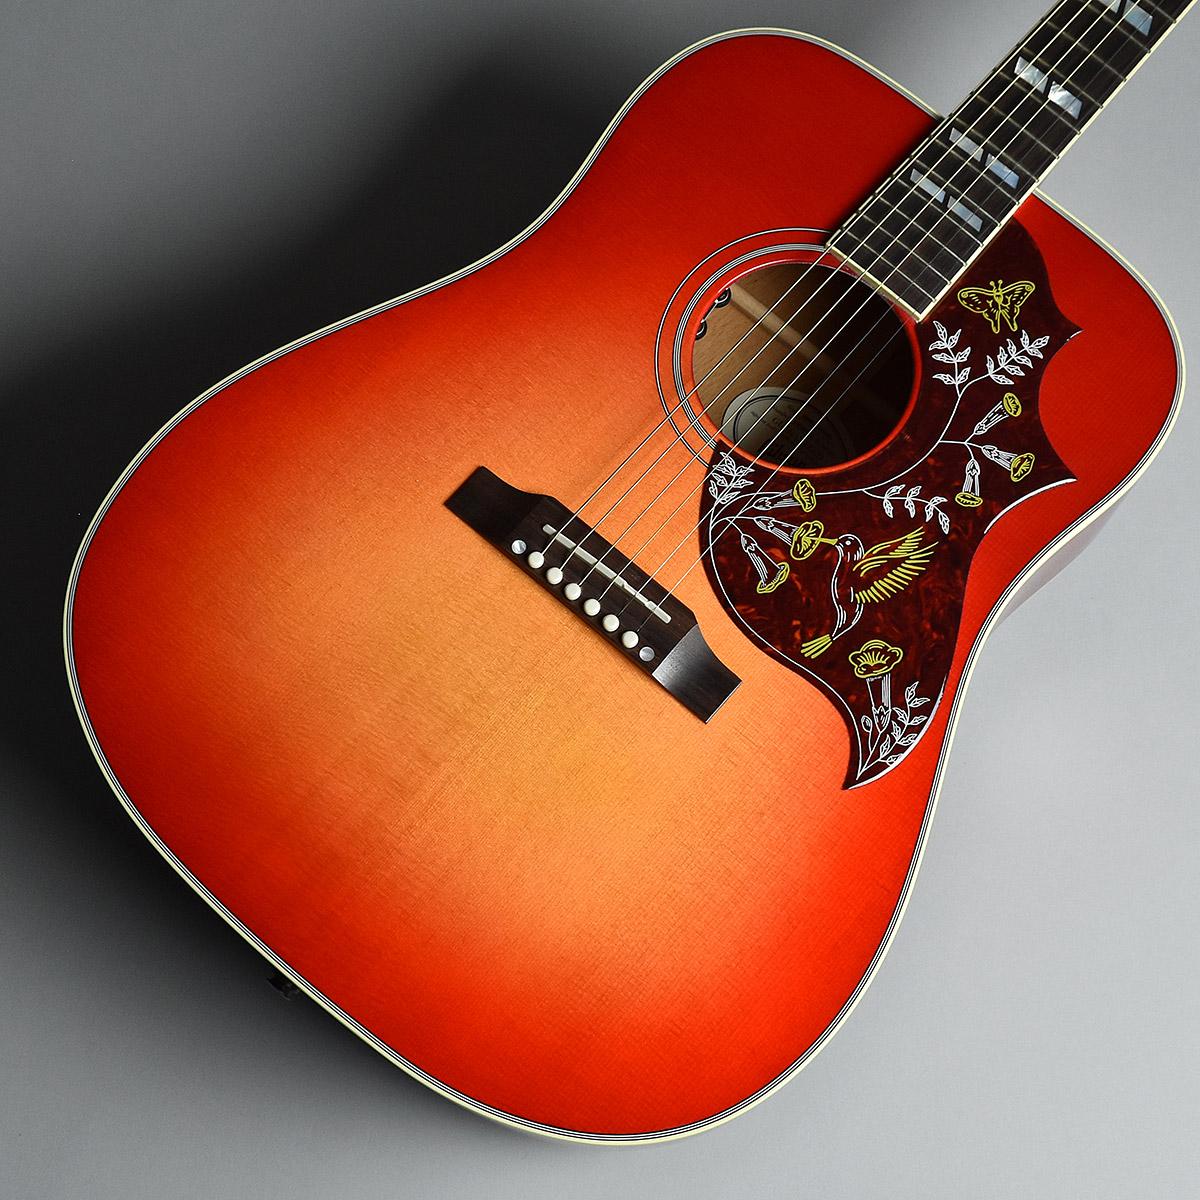 Gibson Hummingbird 2018 Heritage Burst S/N:10088011 エレアコ 【ギブソン】【未展示品】